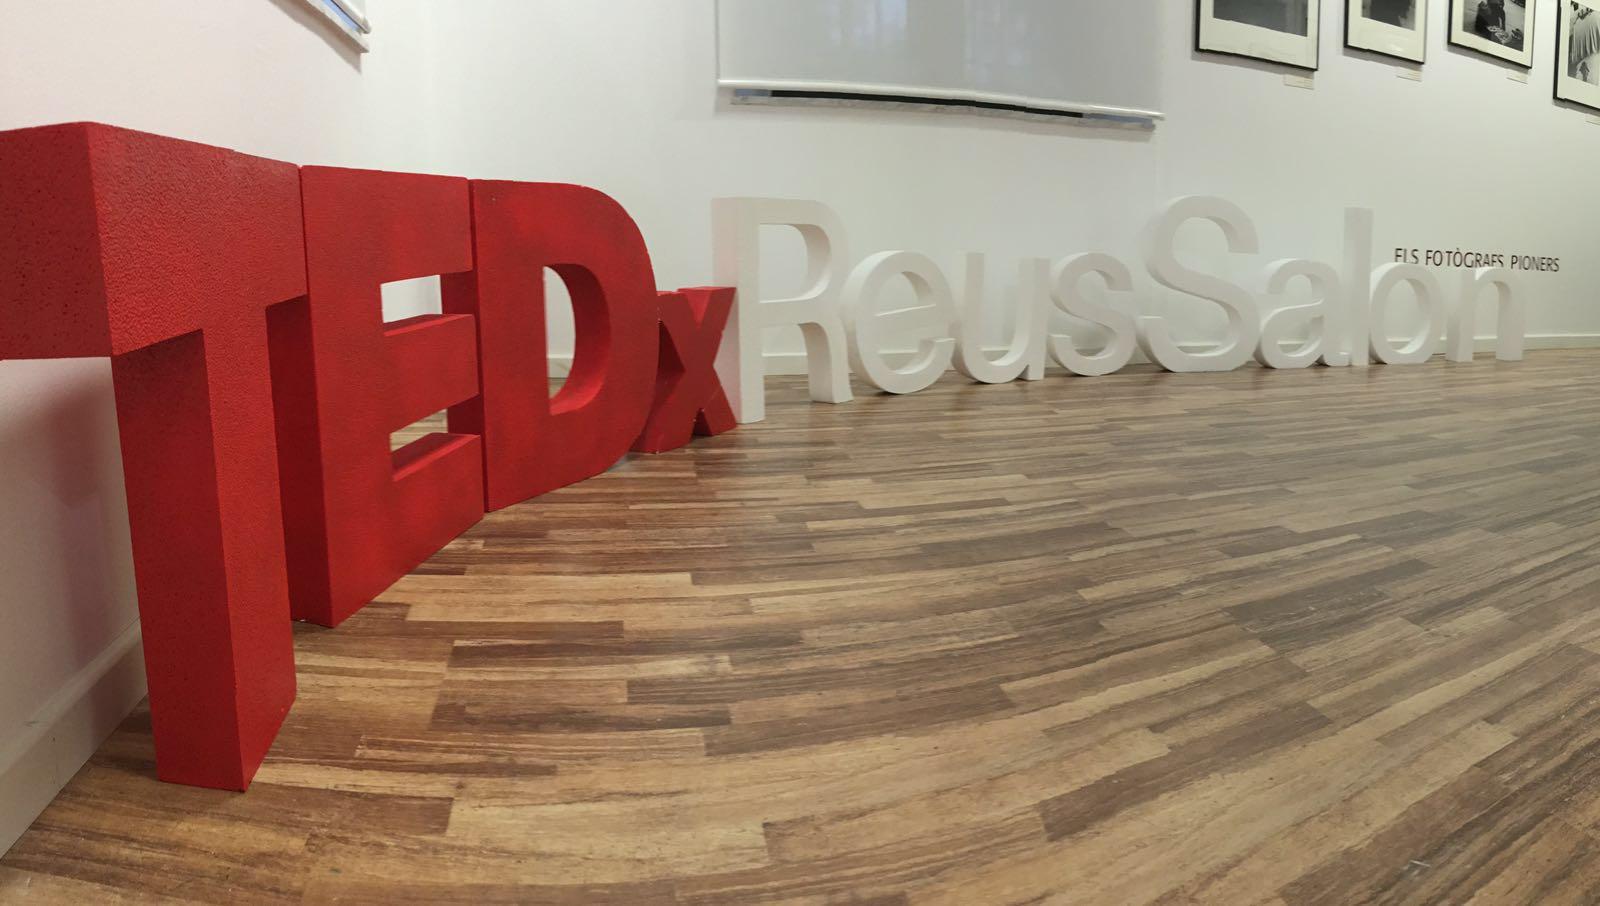 TEDxReusSalon 7th july, 2016